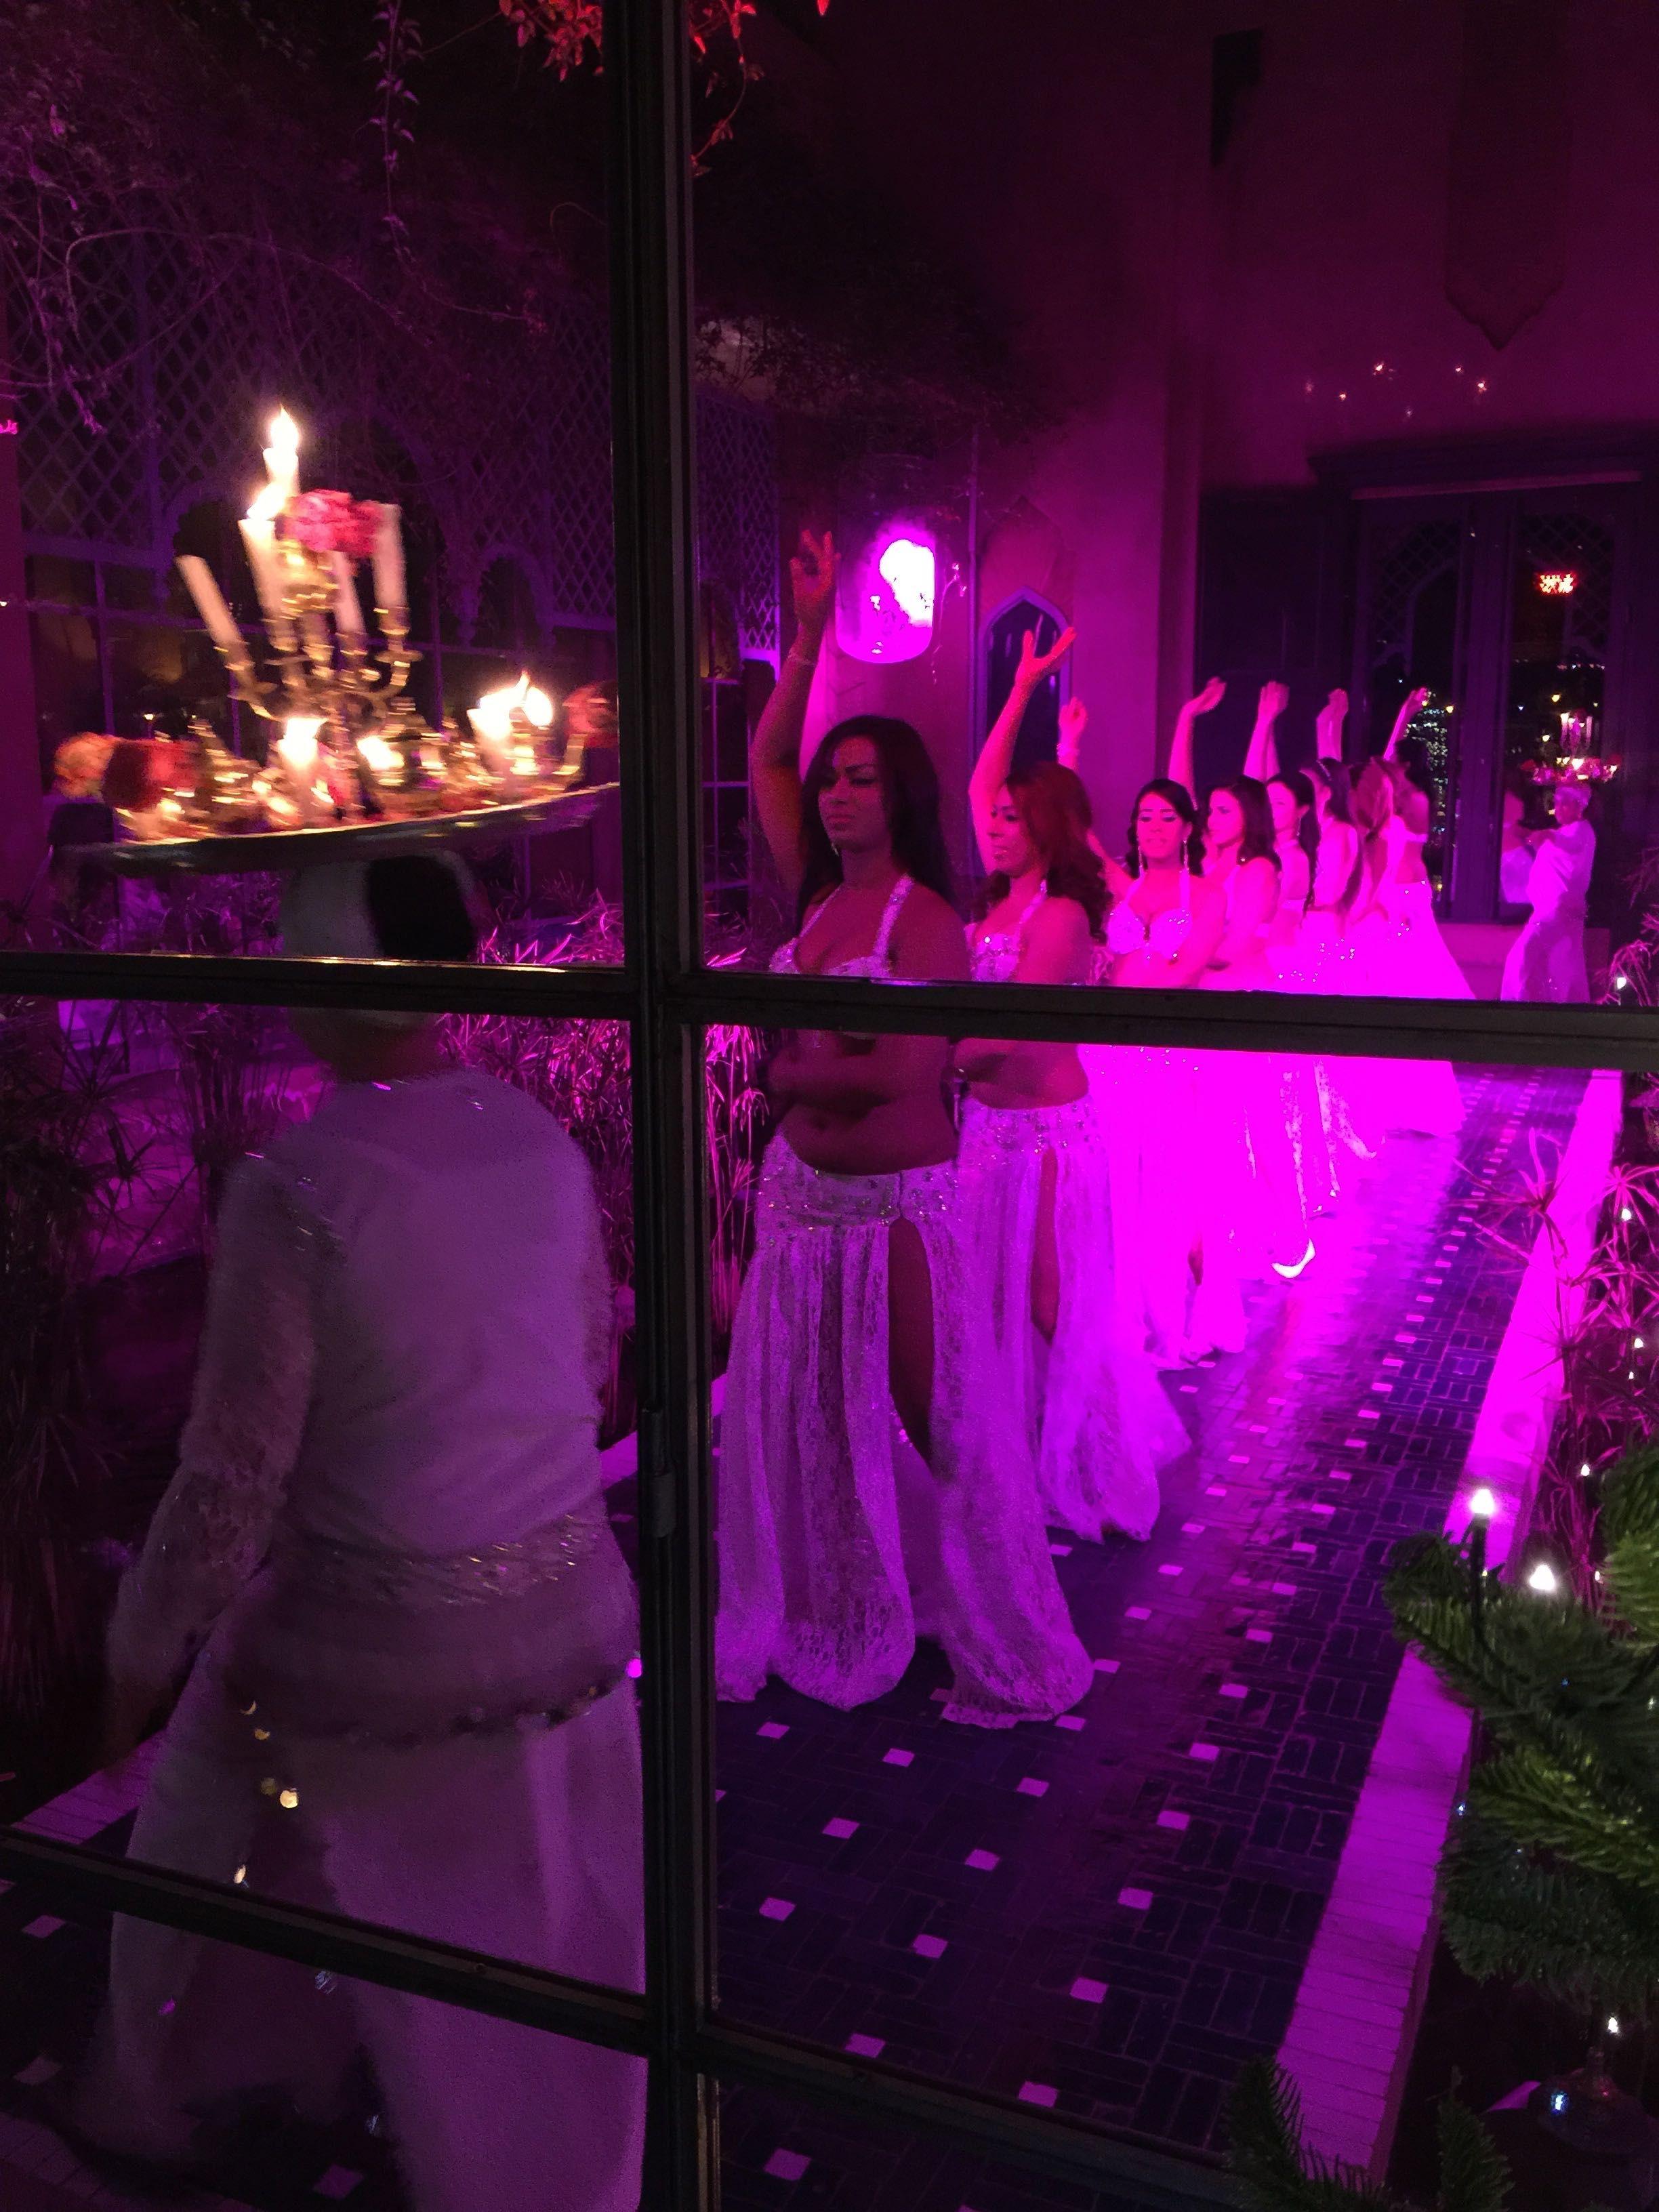 Nightlife A Marrakech Notti Magiche Tra Yacout E Jad Mahal